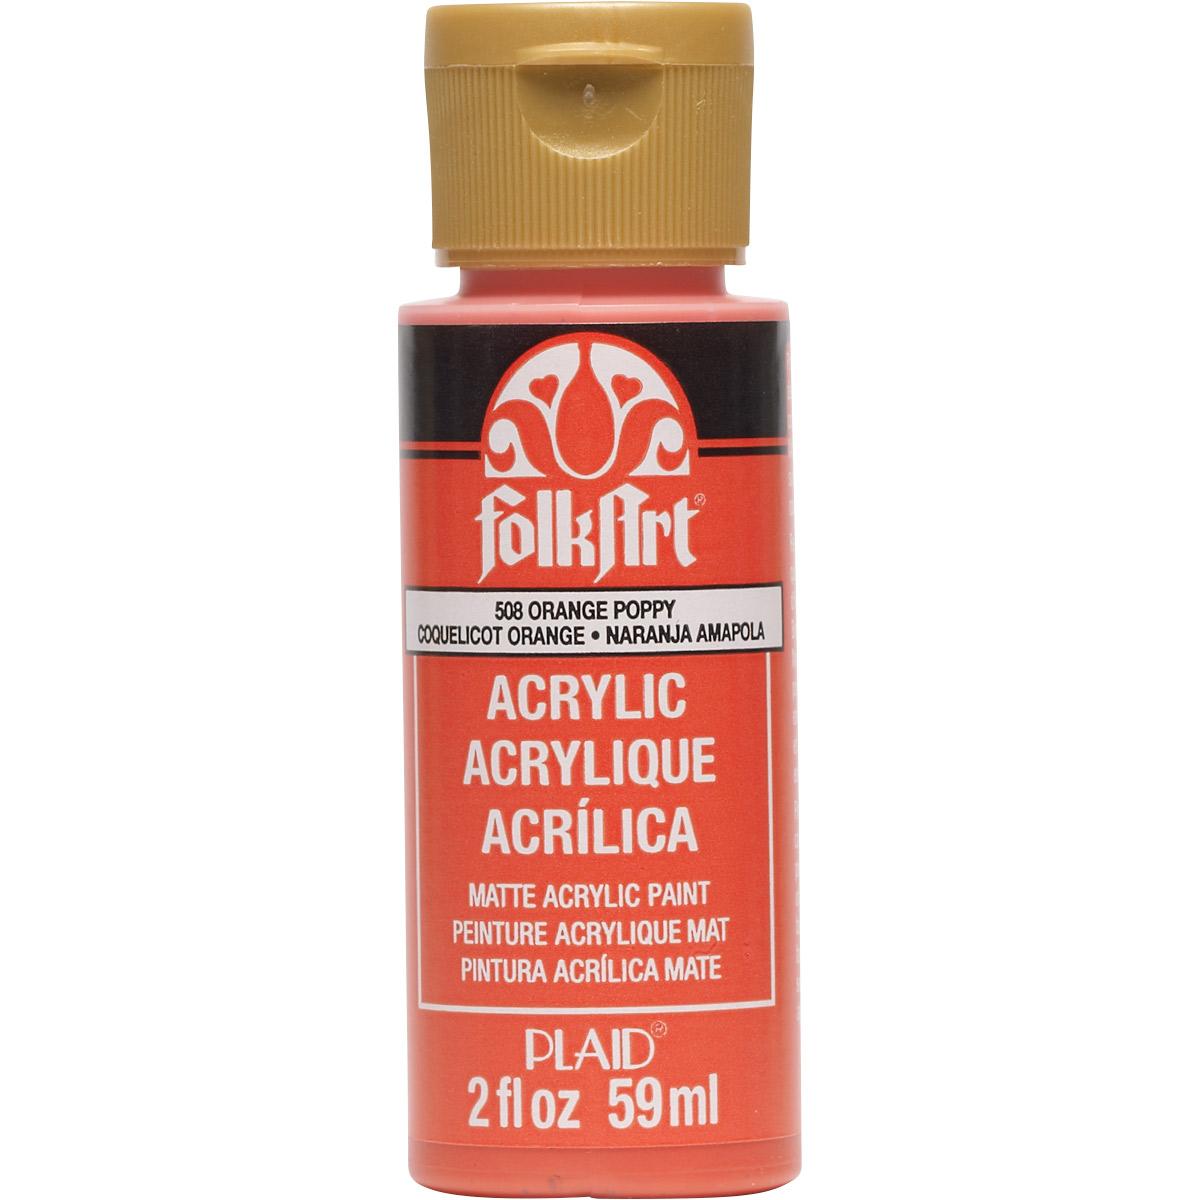 FolkArt ® Acrylic Colors - Orange Poppy, 2 oz.